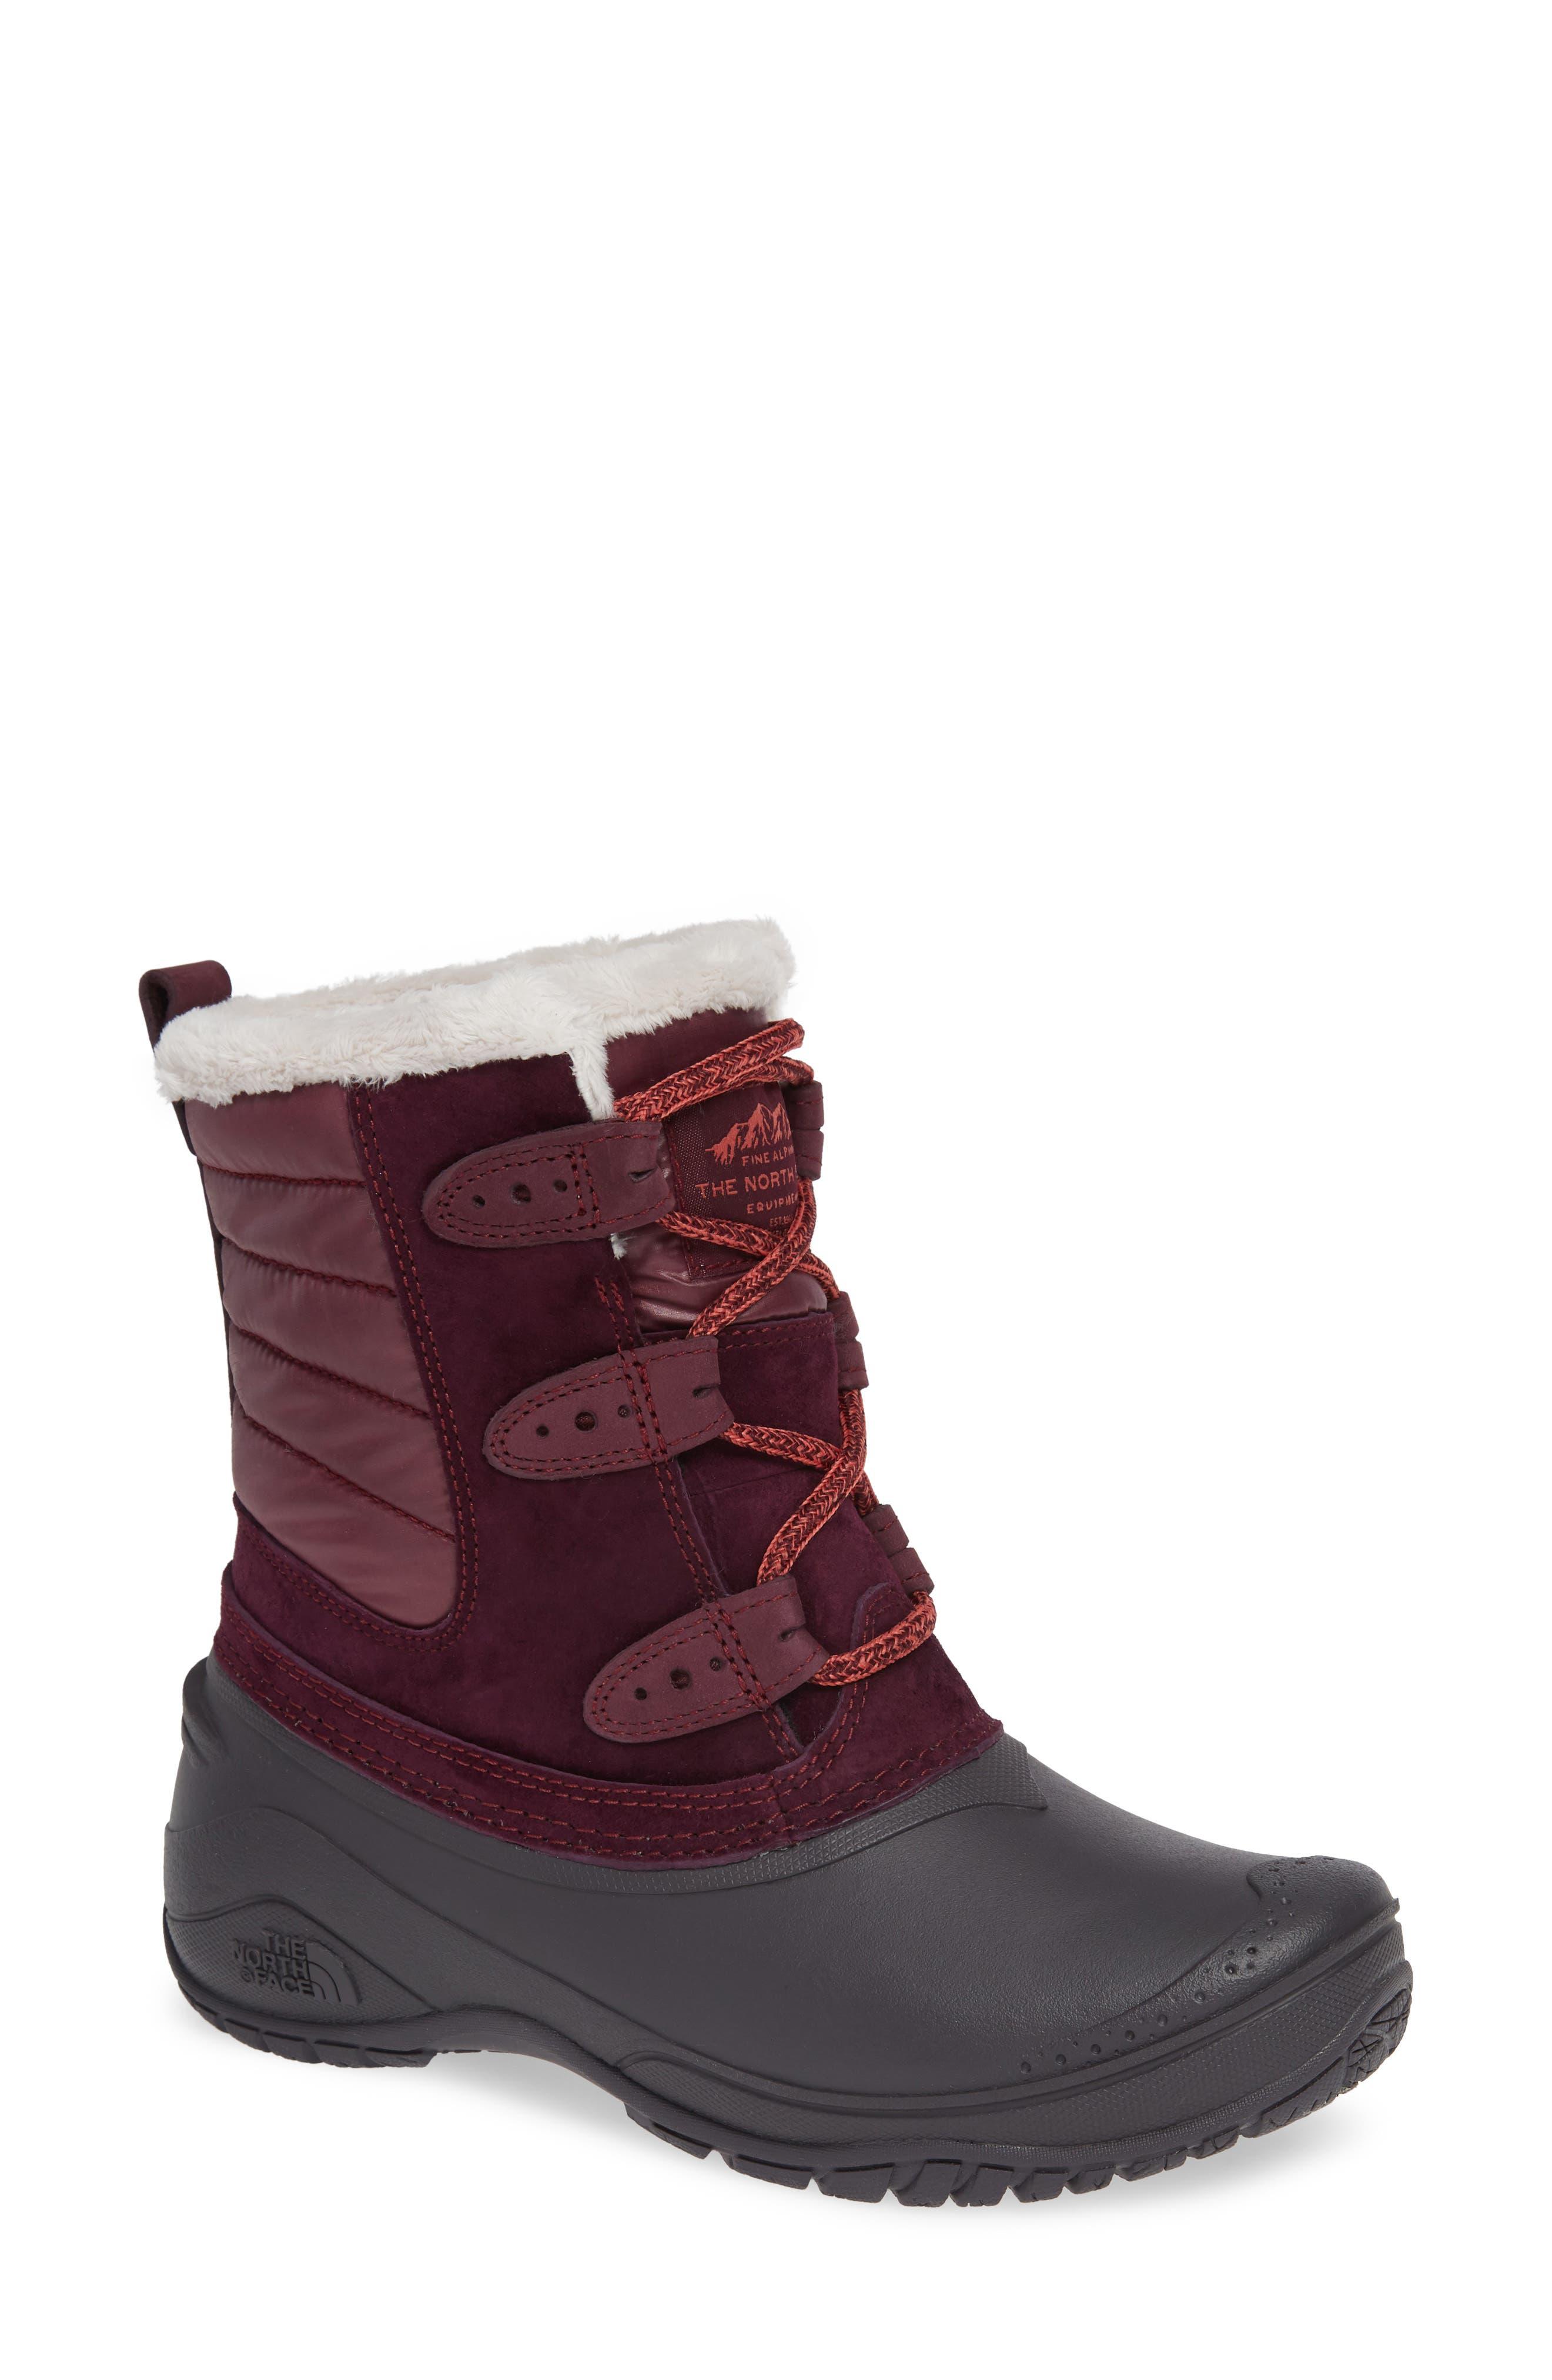 Shellista II Waterproof Boot,                             Main thumbnail 1, color,                             930